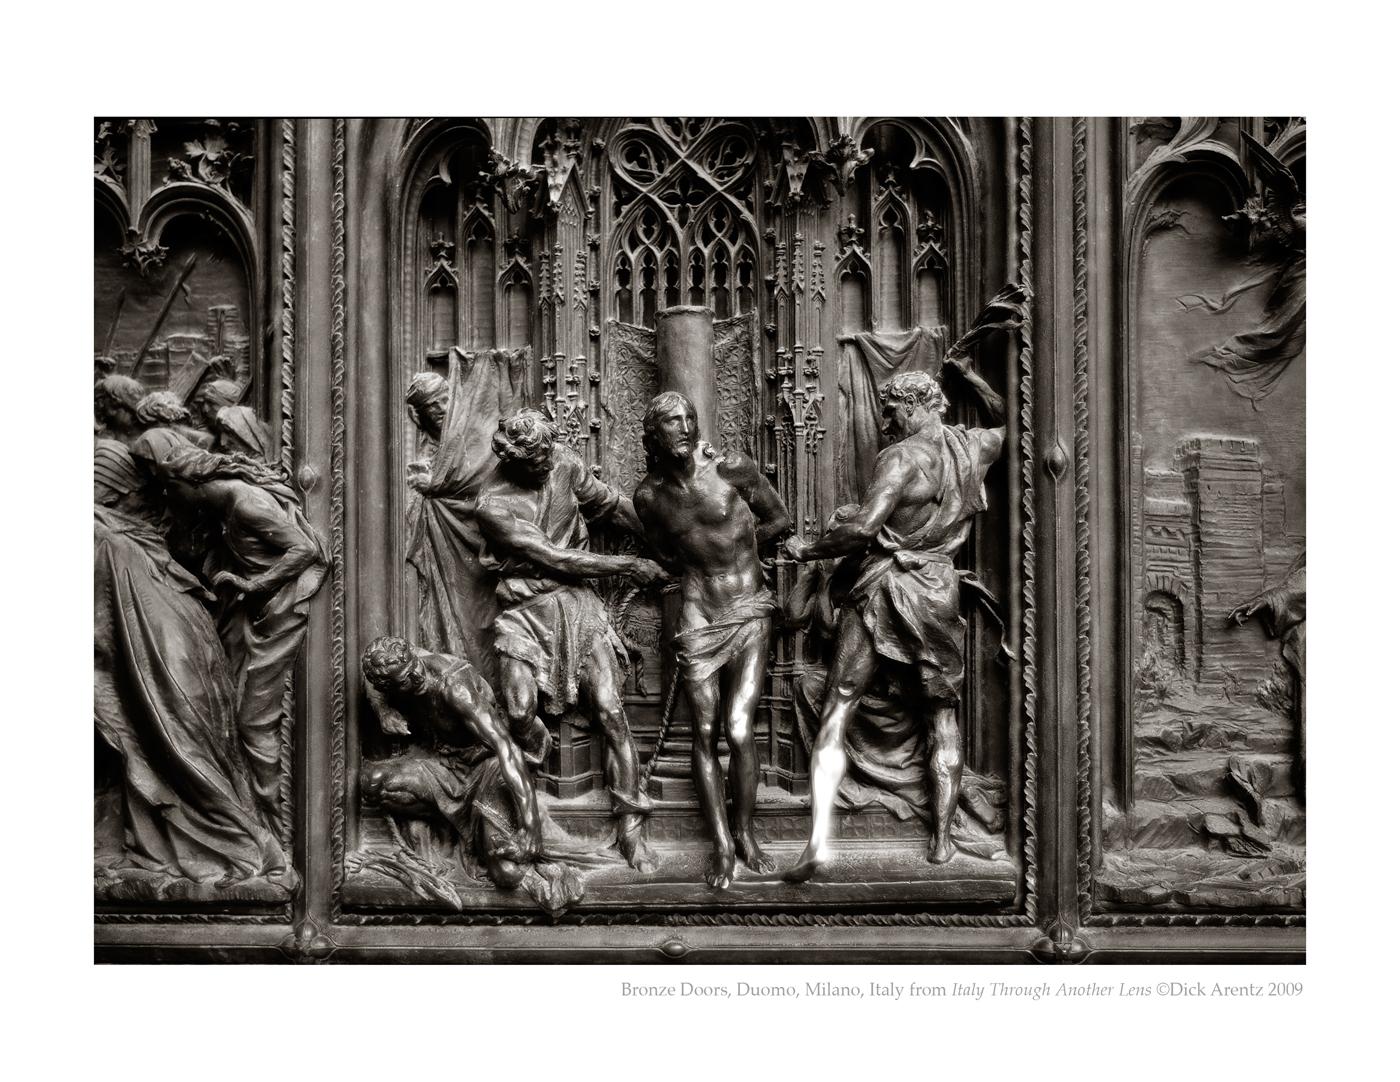 Bronze Doors, Duomo, Milano, Italy - Italy Through Another Lens